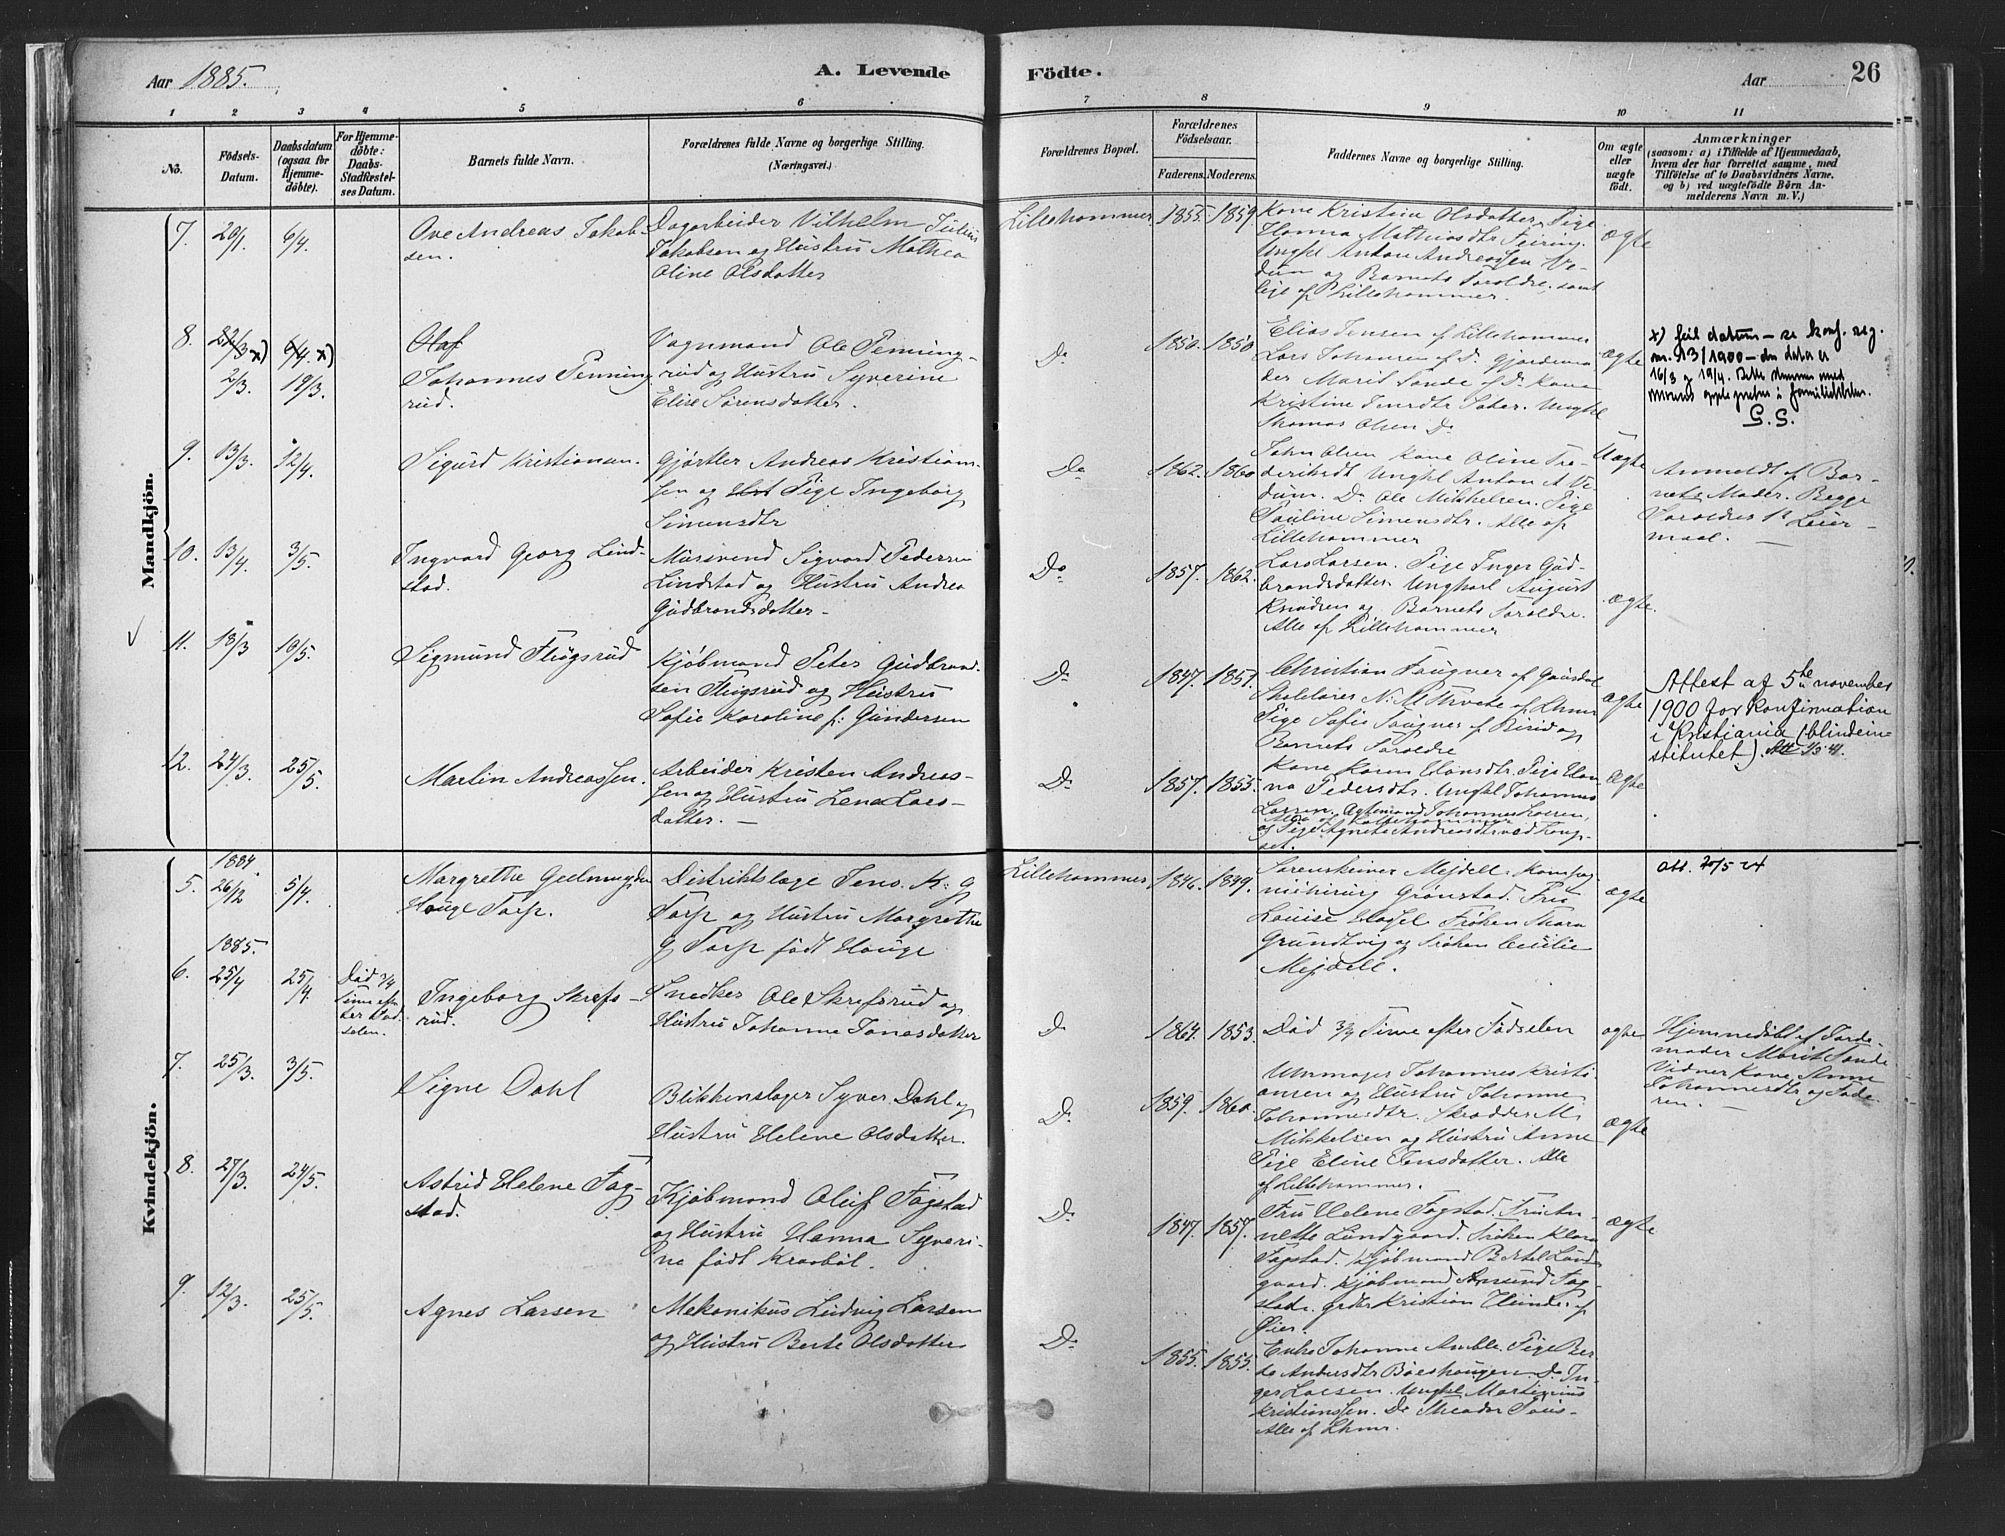 SAH, Fåberg prestekontor, H/Ha/Haa/L0010: Parish register (official) no. 10, 1879-1900, p. 26